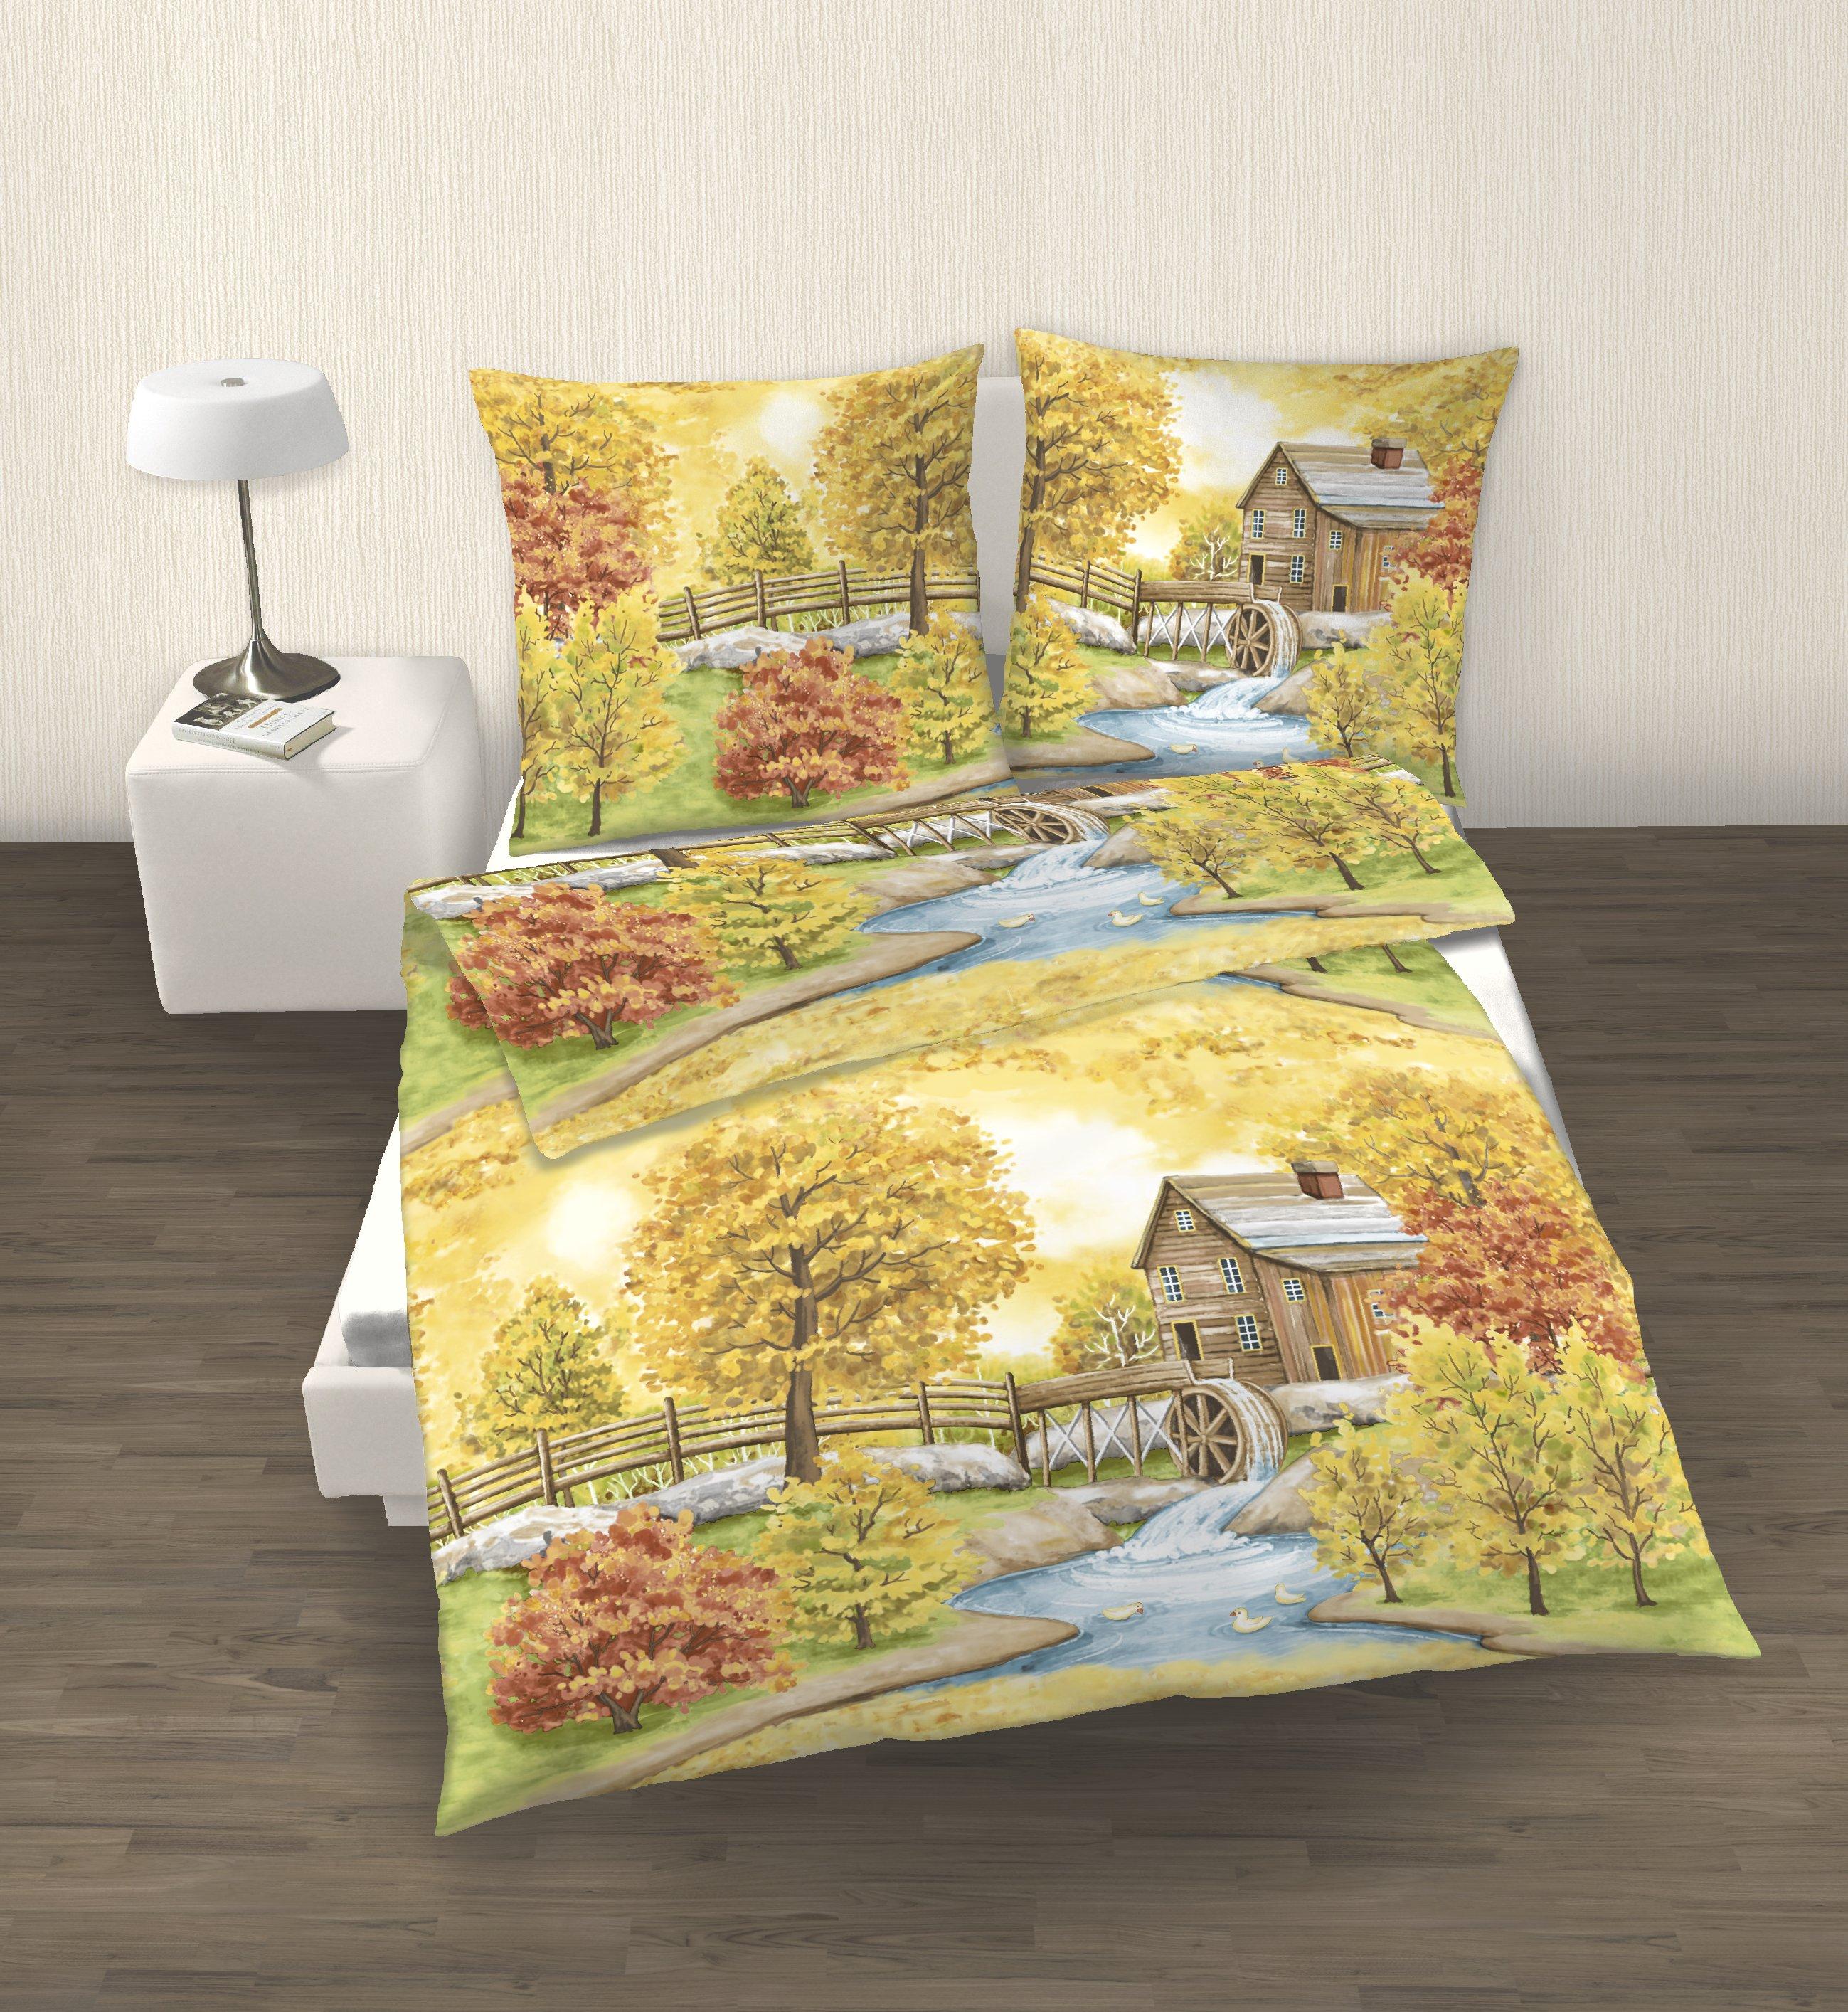 2 tlg bettw sche 155 x 220 cm herbstlandschaft biber. Black Bedroom Furniture Sets. Home Design Ideas